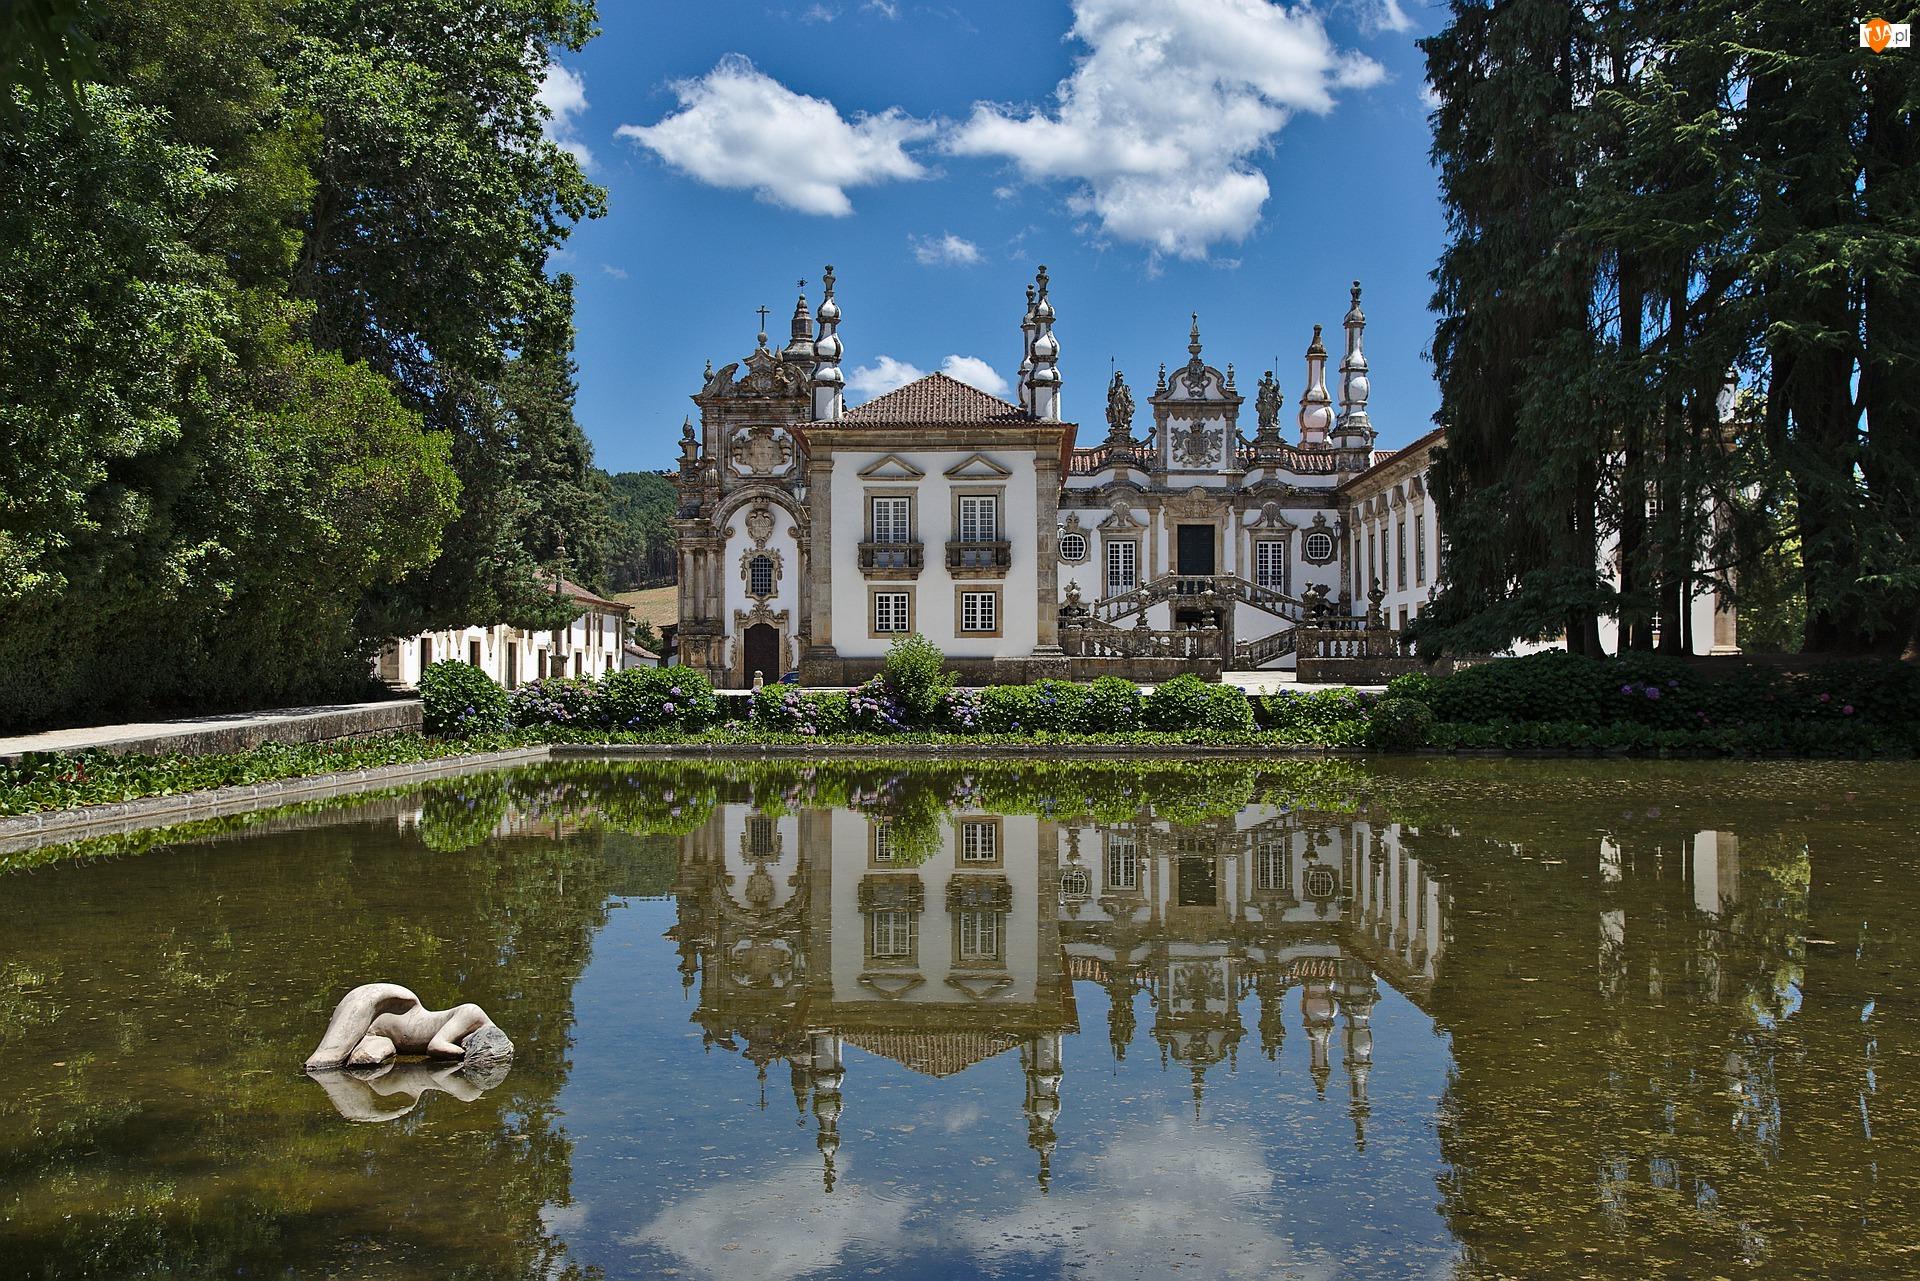 Casa de Mateus, Pałac, Staw, Portugalia, Drzewa, Vila Real